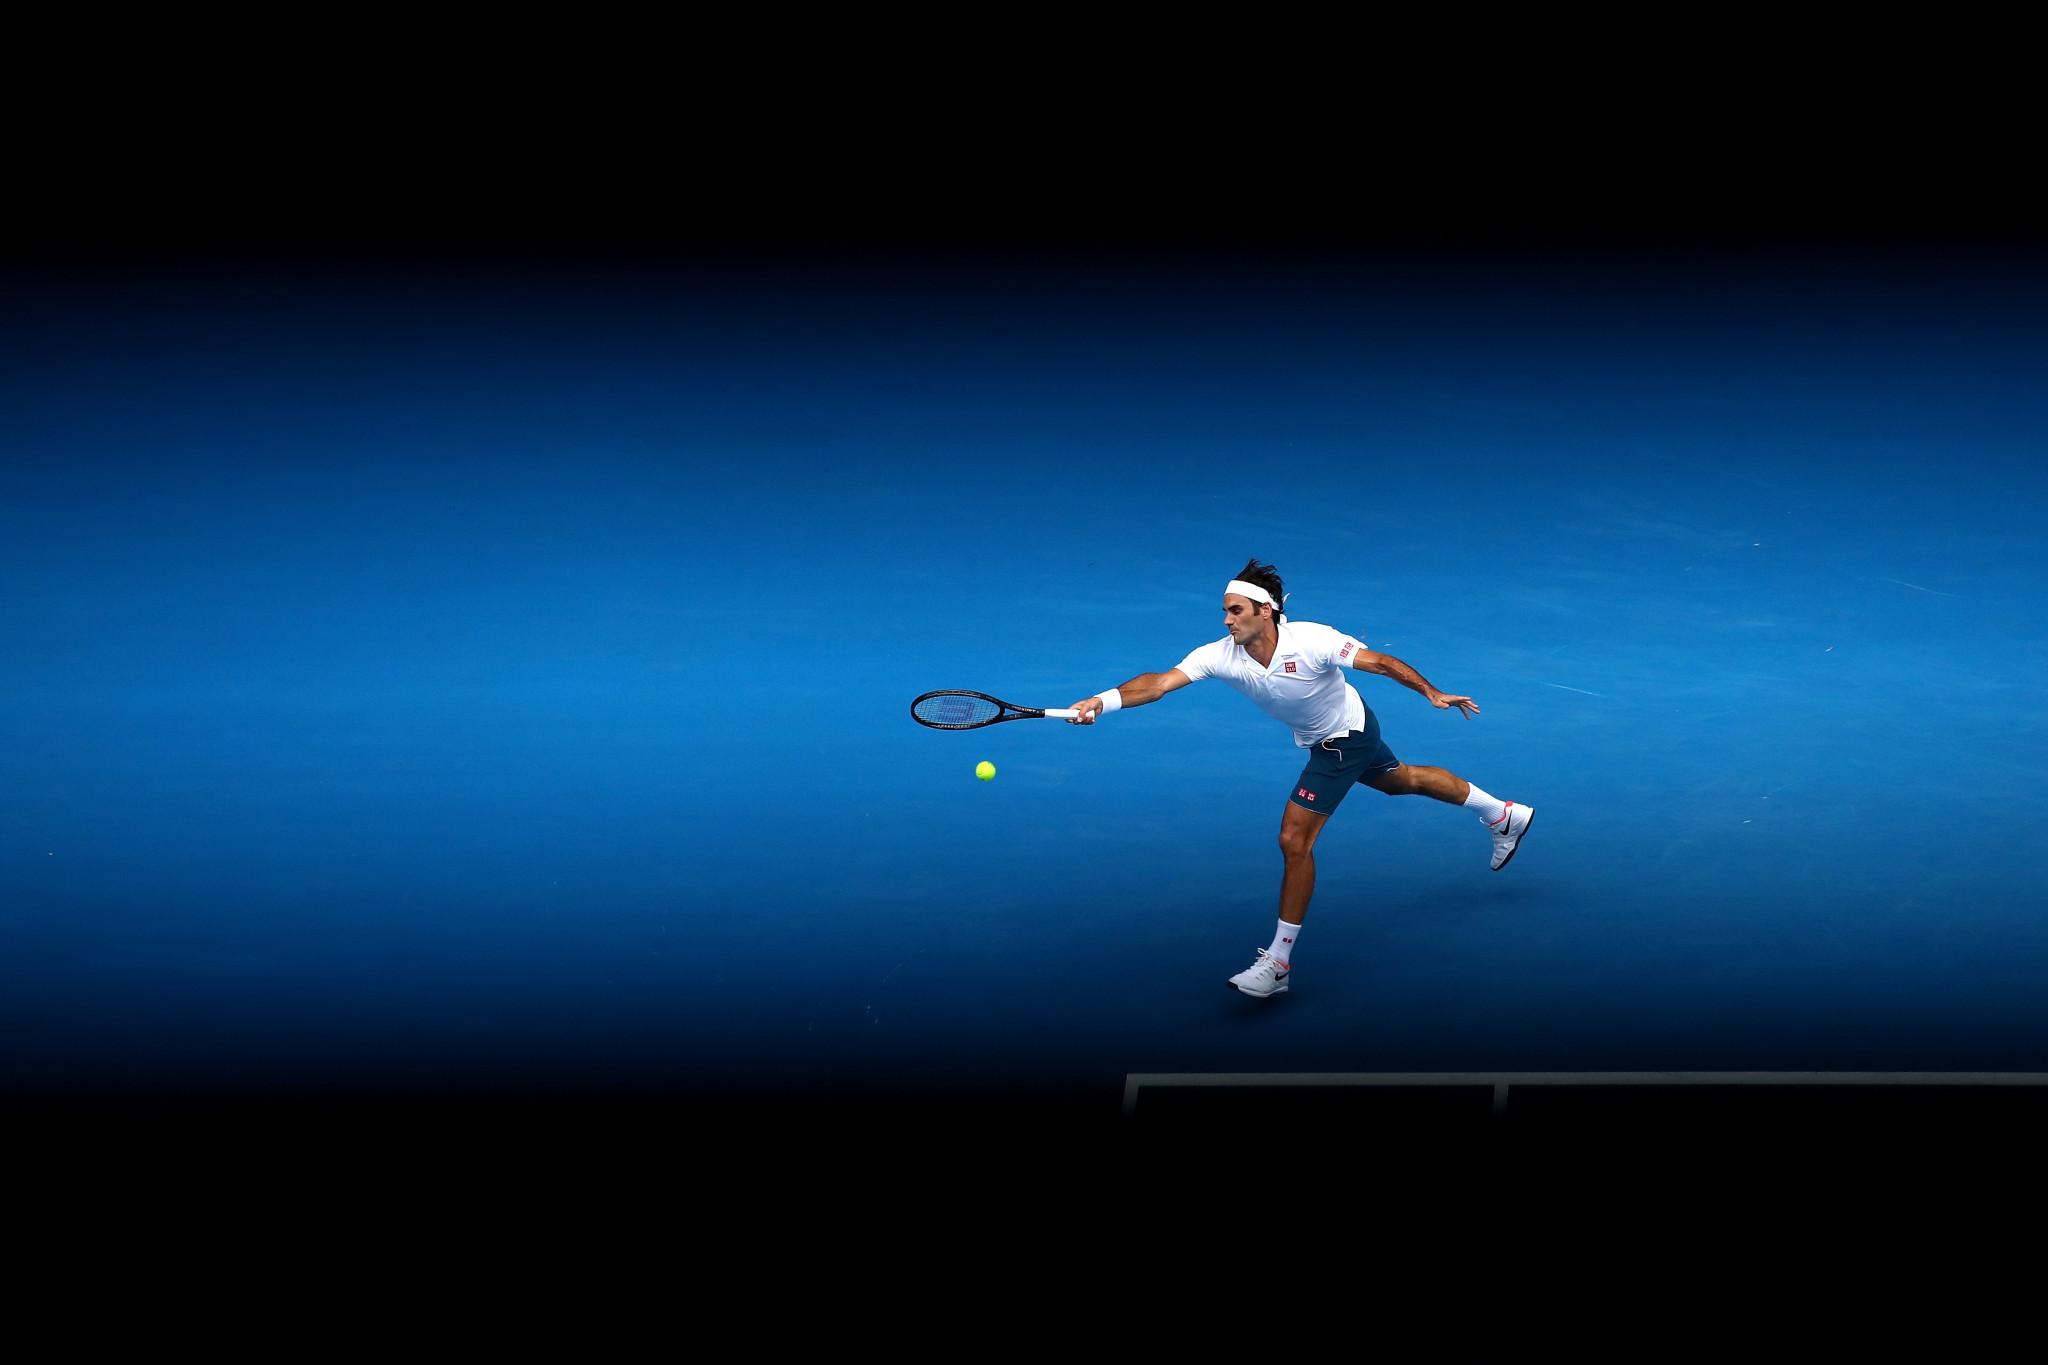 Defending champions Federer and Wozniacki through to third round at Australian Open